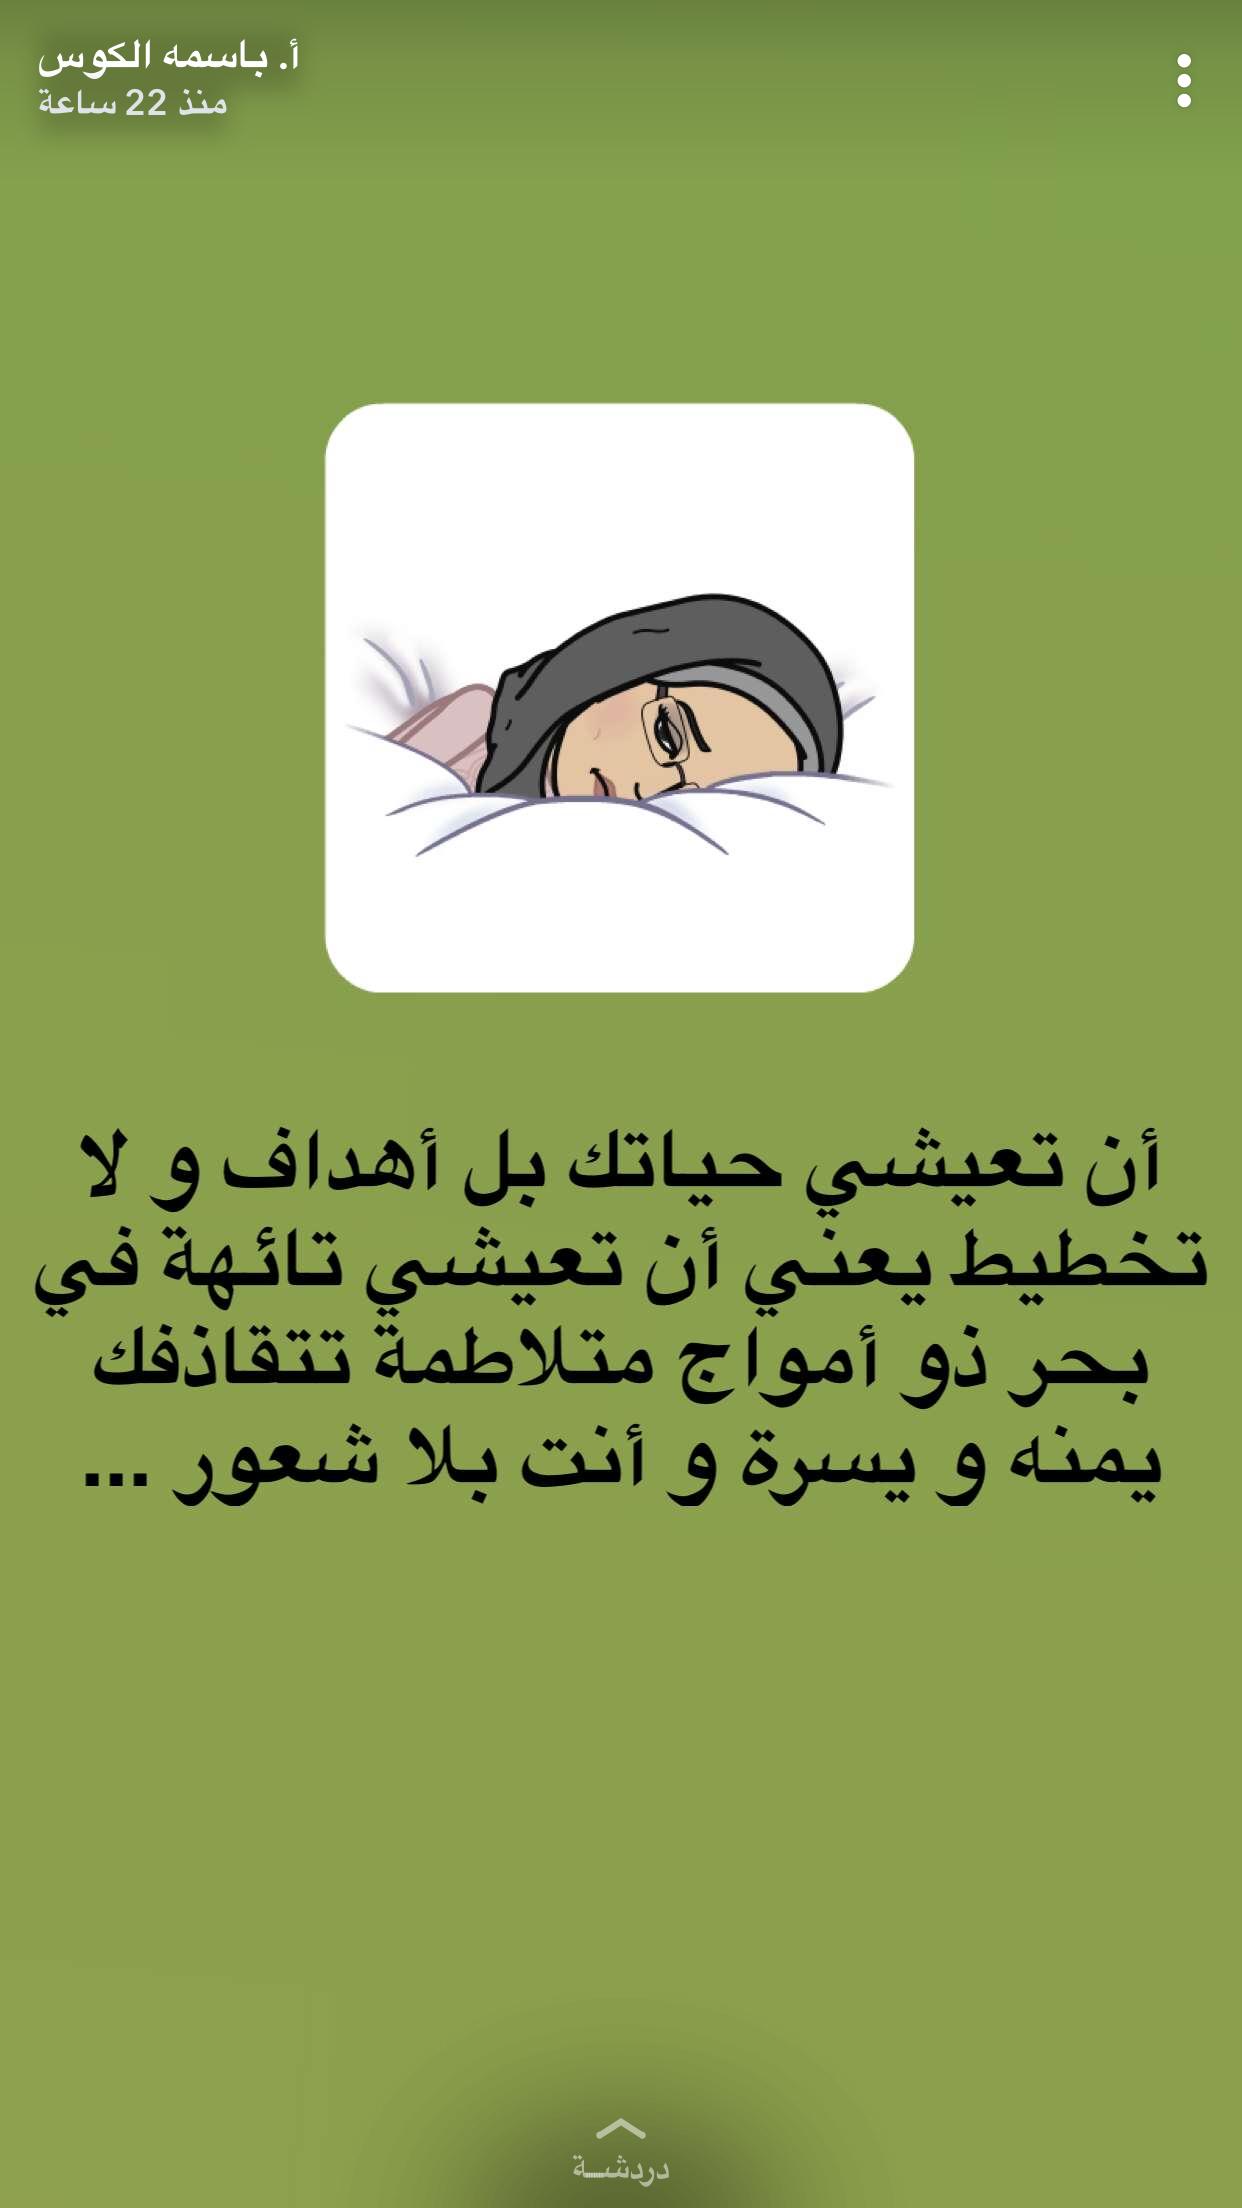 Pin By Reem On أ باسمة الكوس Memes Movie Posters Poster